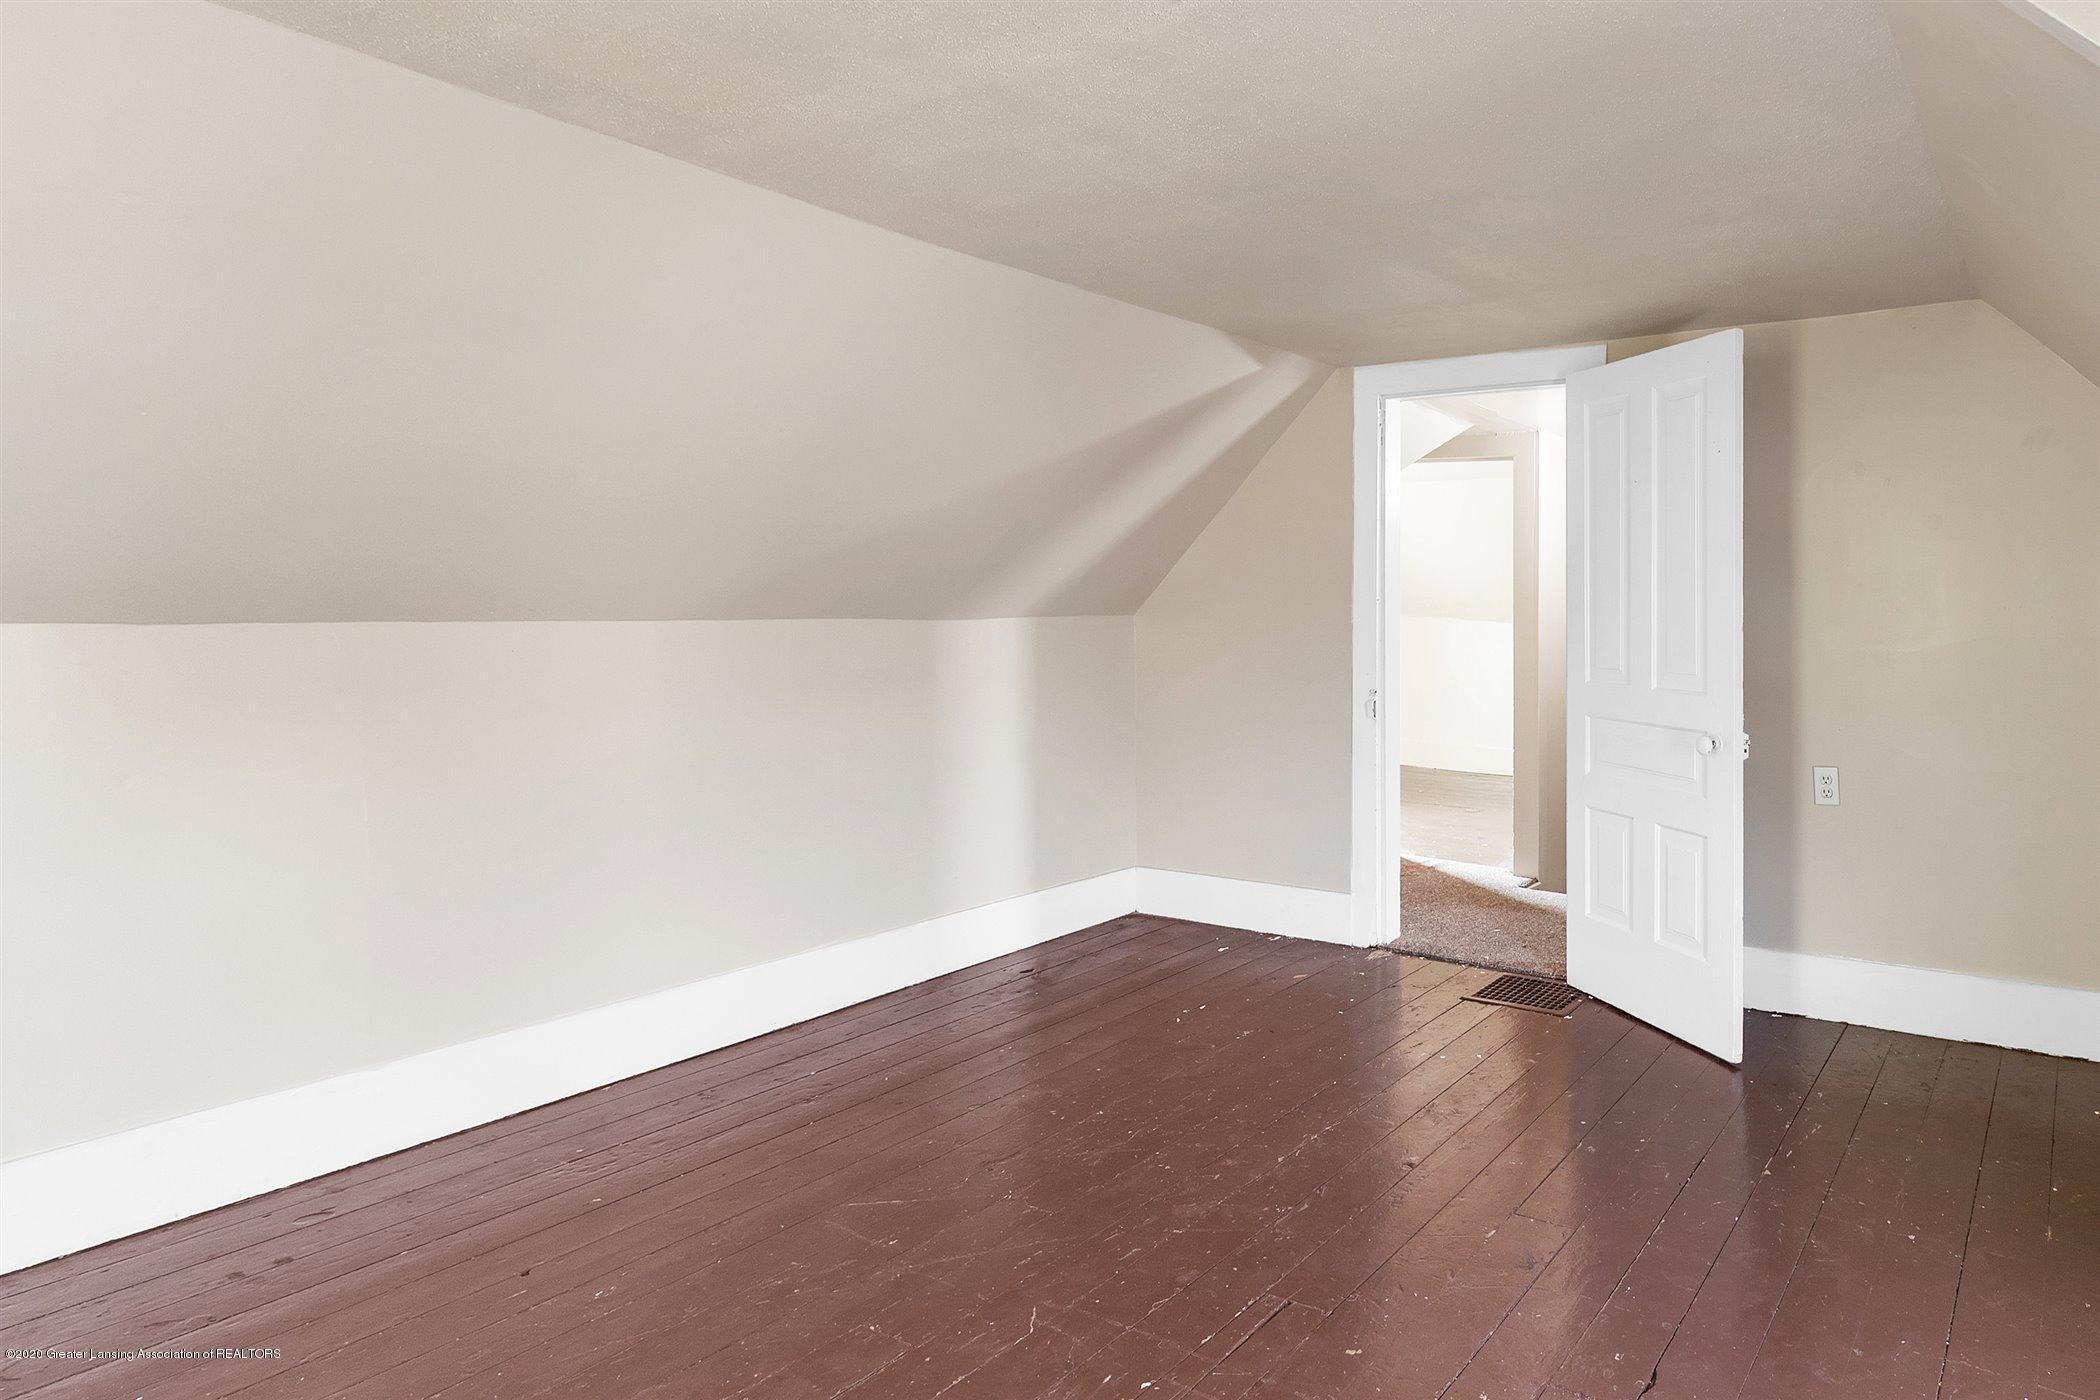 114 E Knight St - Upstairs bedroom #1 - 23